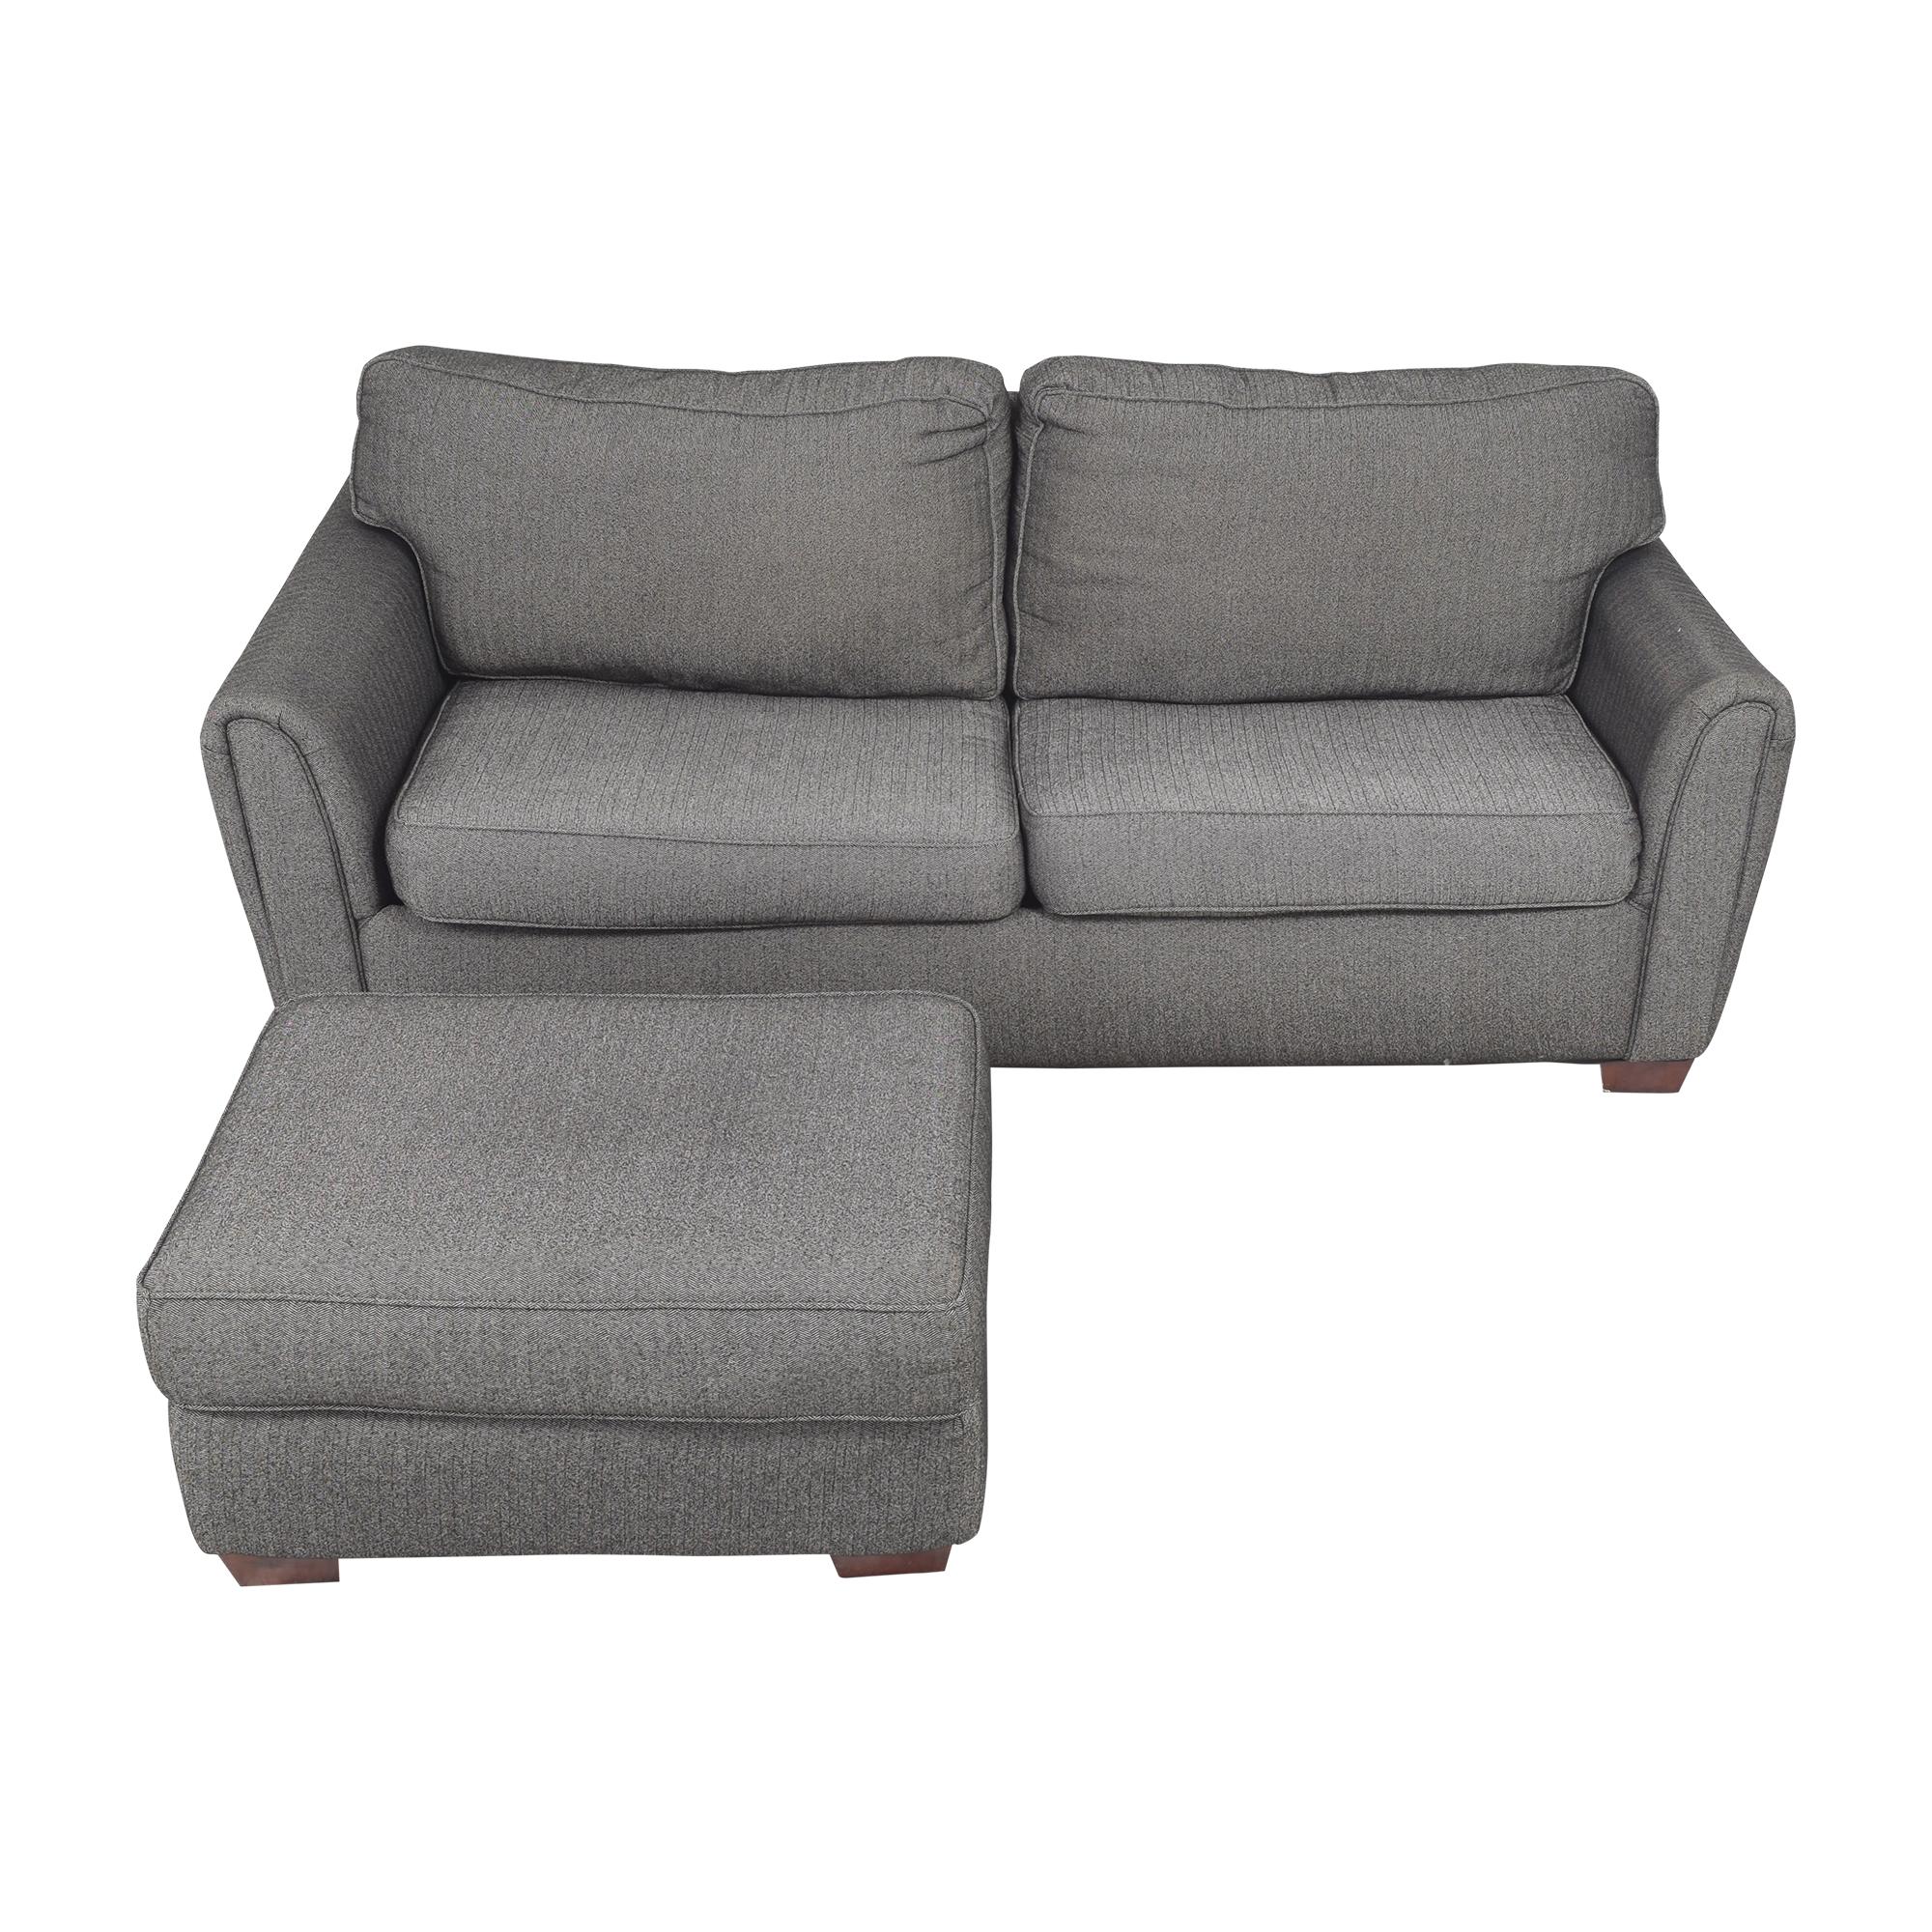 shop Corinthian Contemporary Sofa with Ottoman Corinthian Classic Sofas